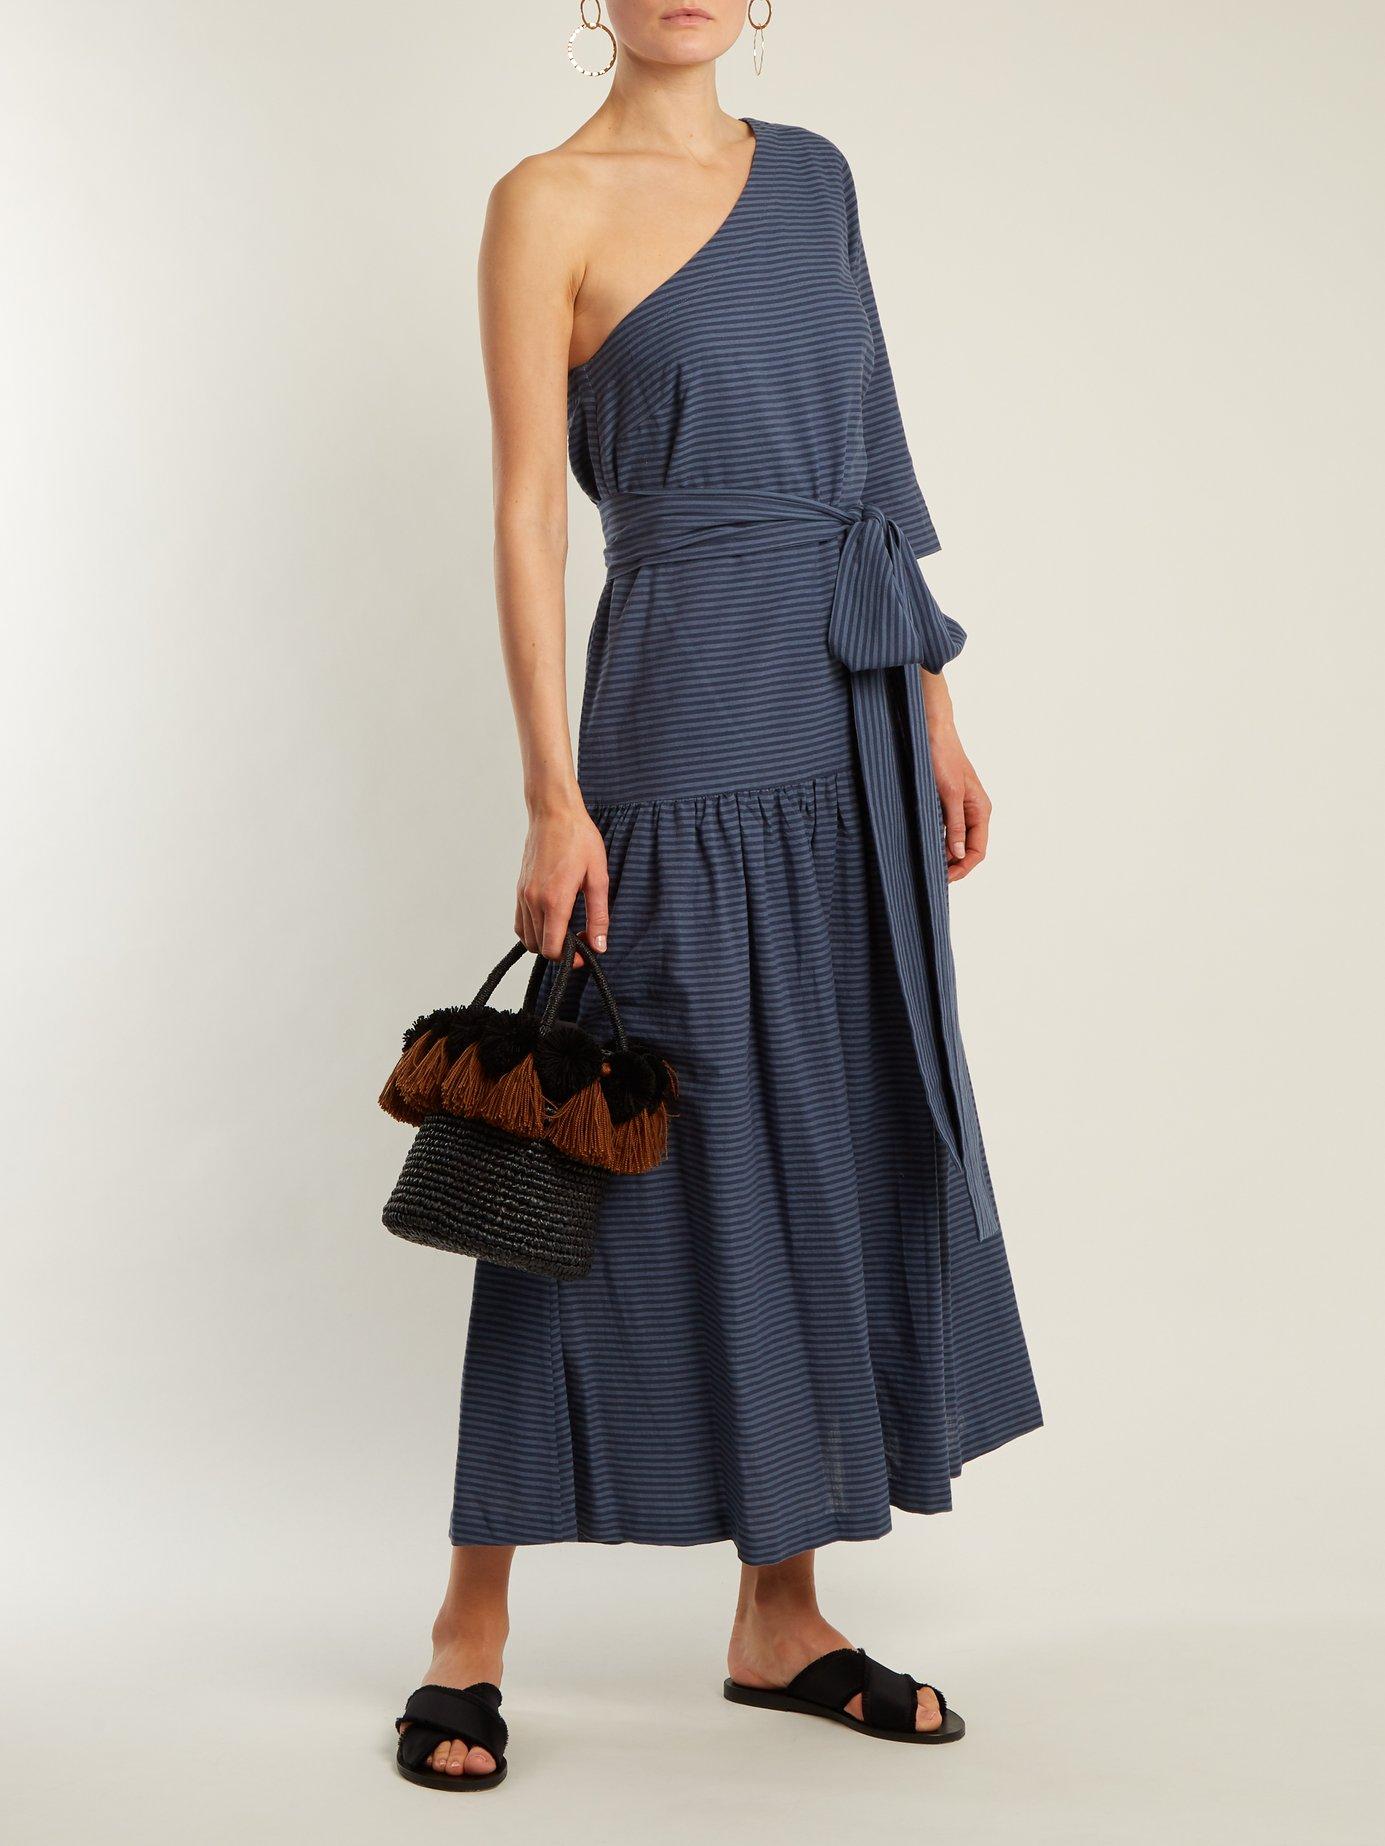 Sam one-shoulder striped cotton dress by Mara Hoffman